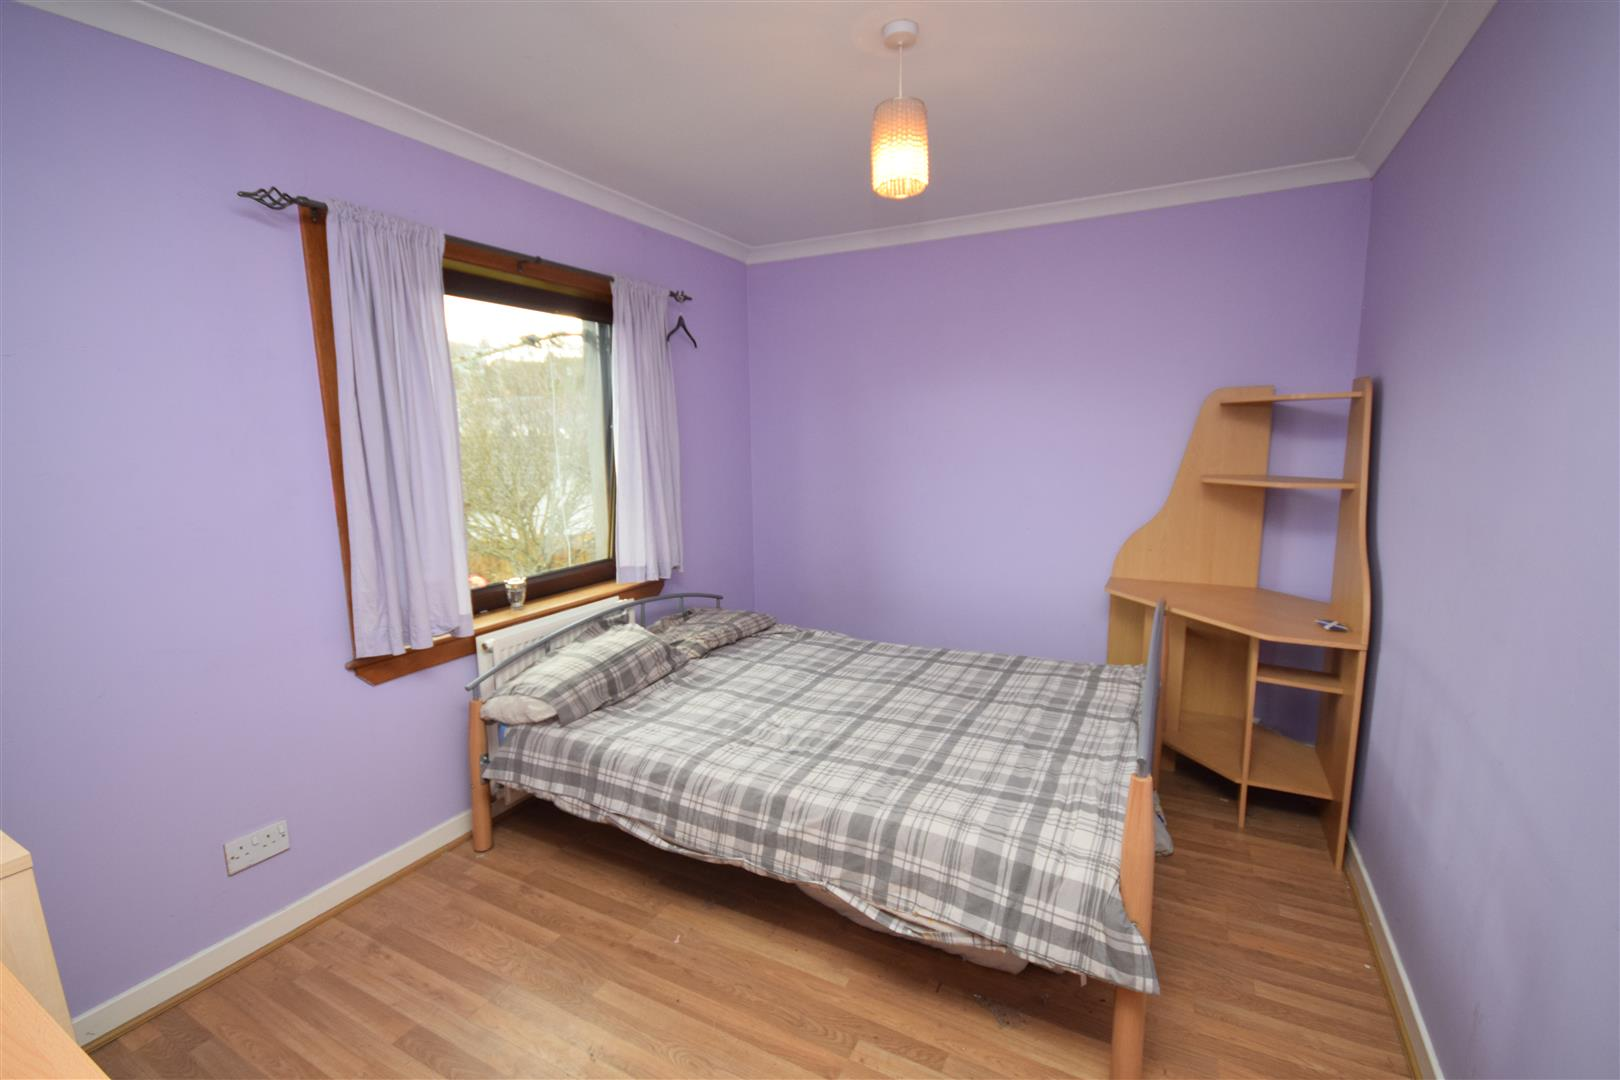 7, Tulloch Terrace, Perth, Perthshire, PH1 2PF, UK